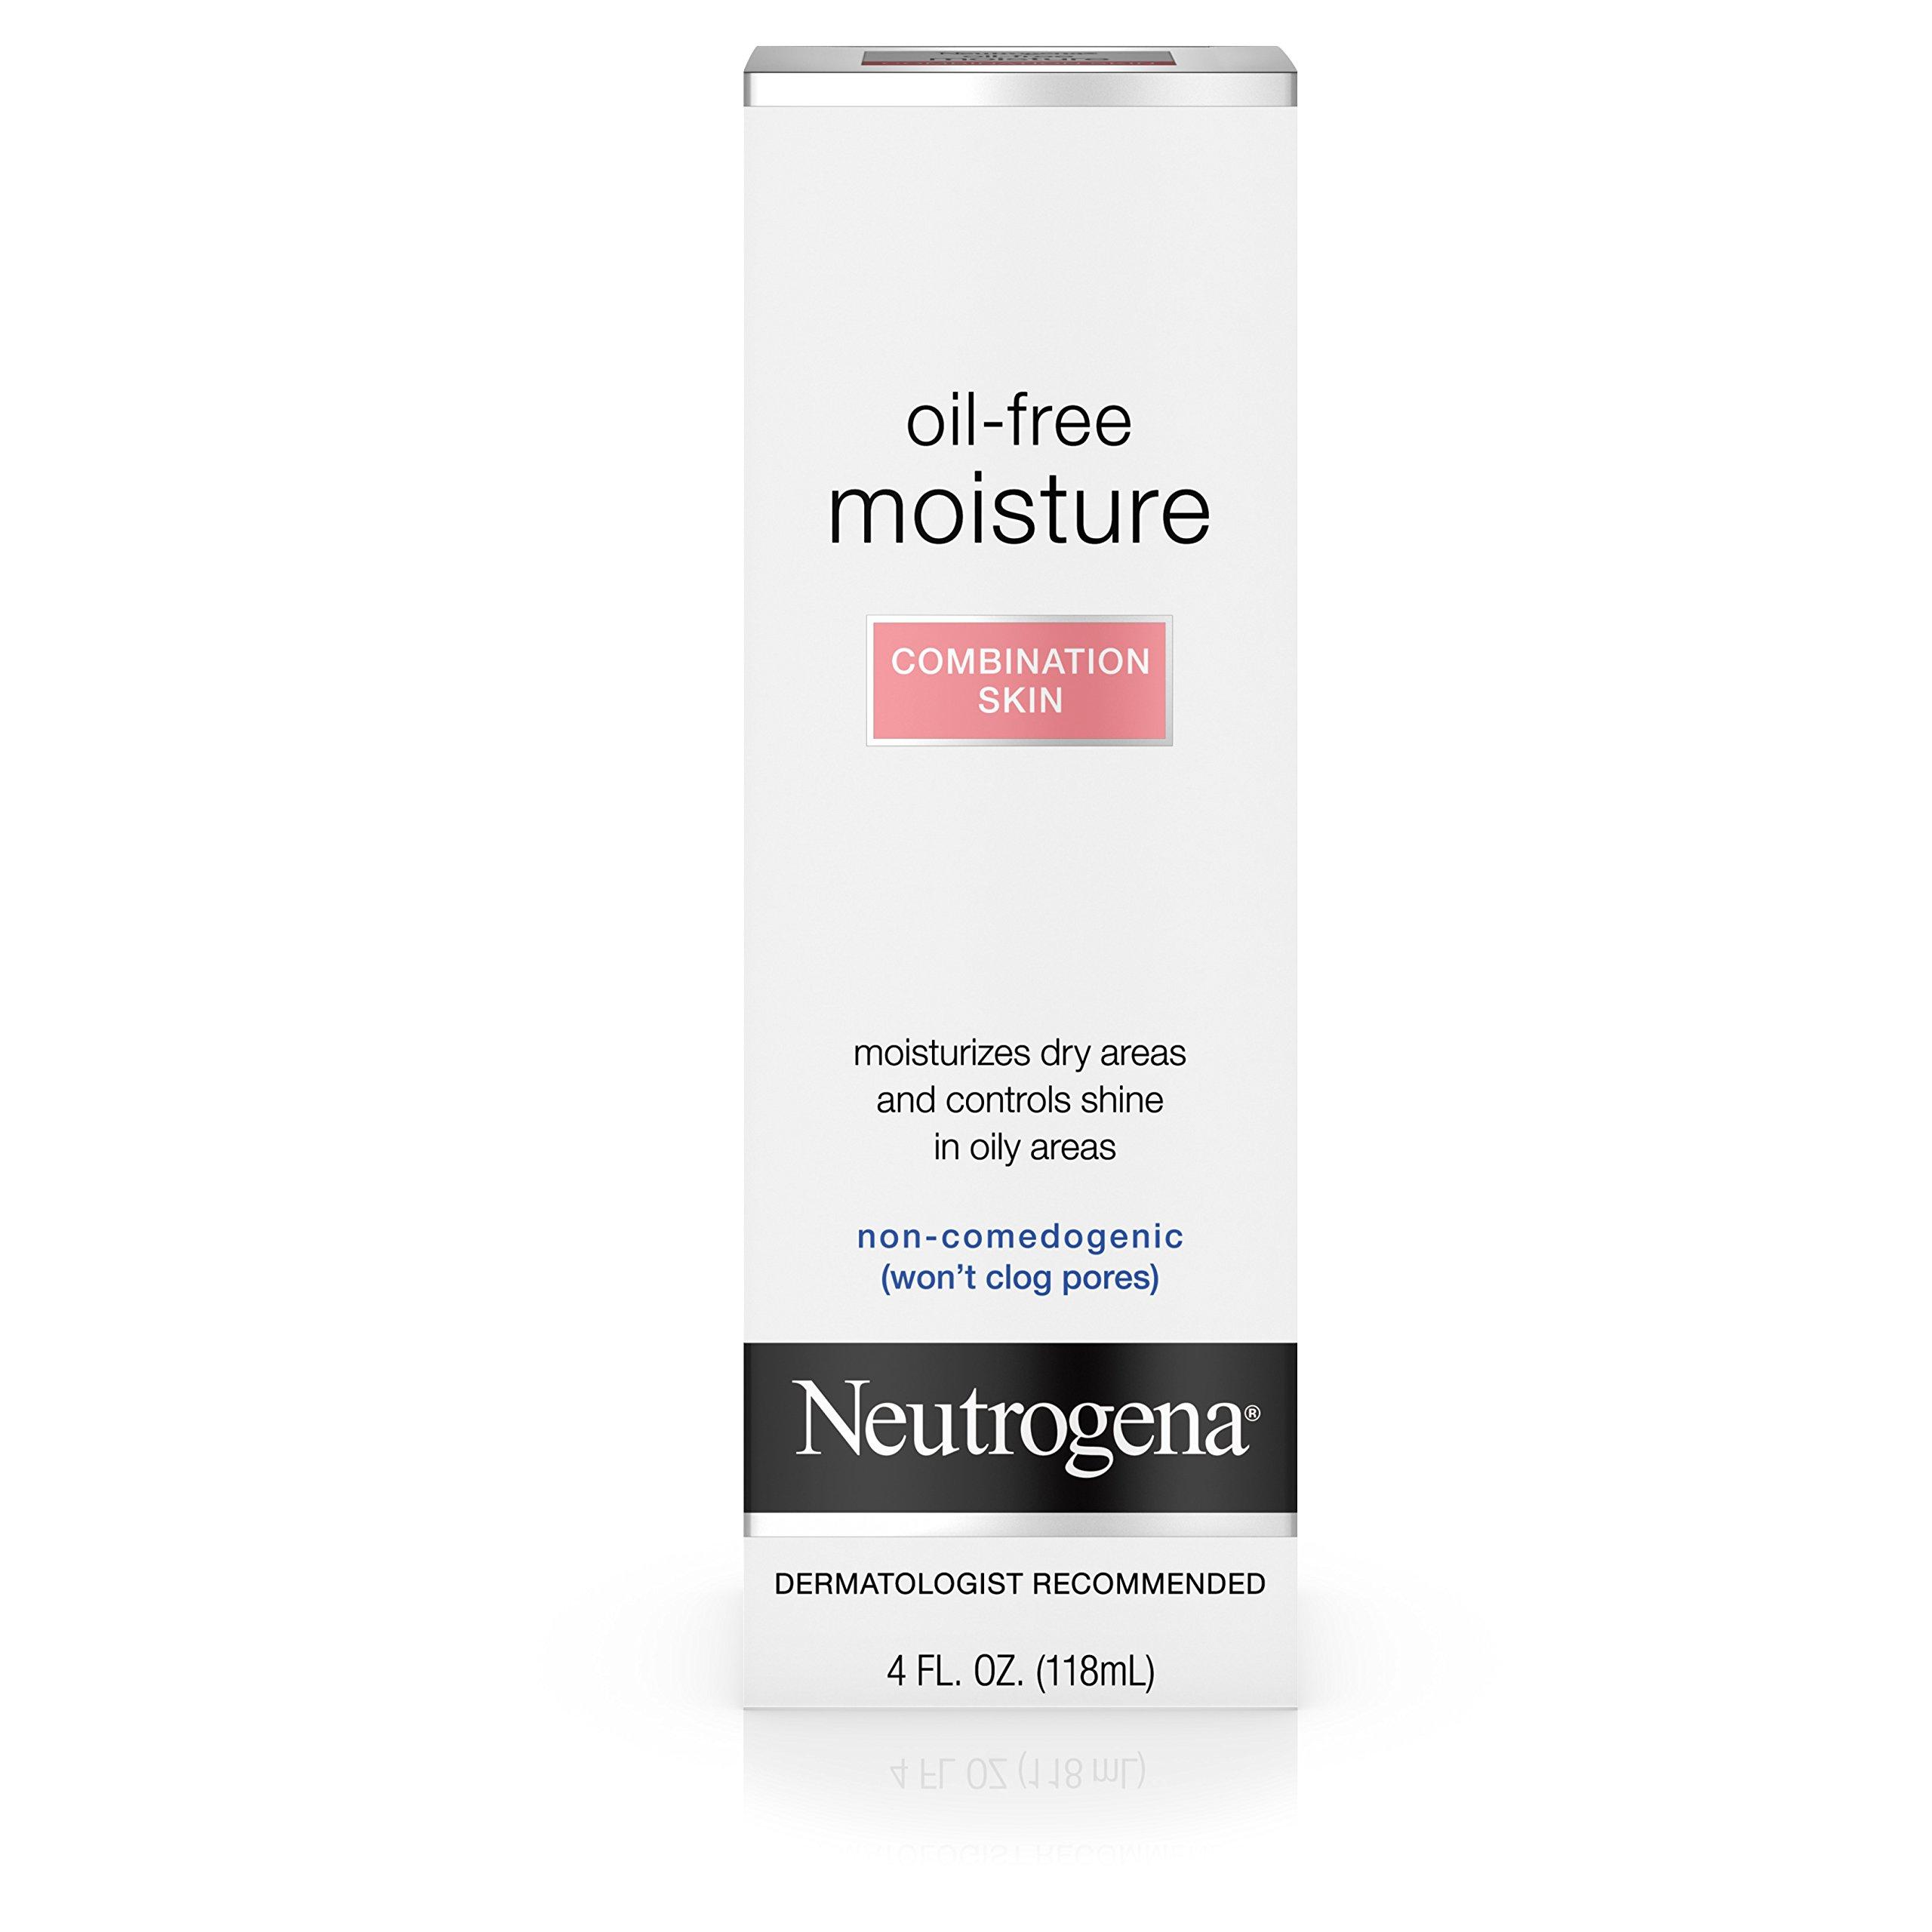 Neutrogena Oil-Free Moisture, Combination Skin, 4 Fl. Oz.